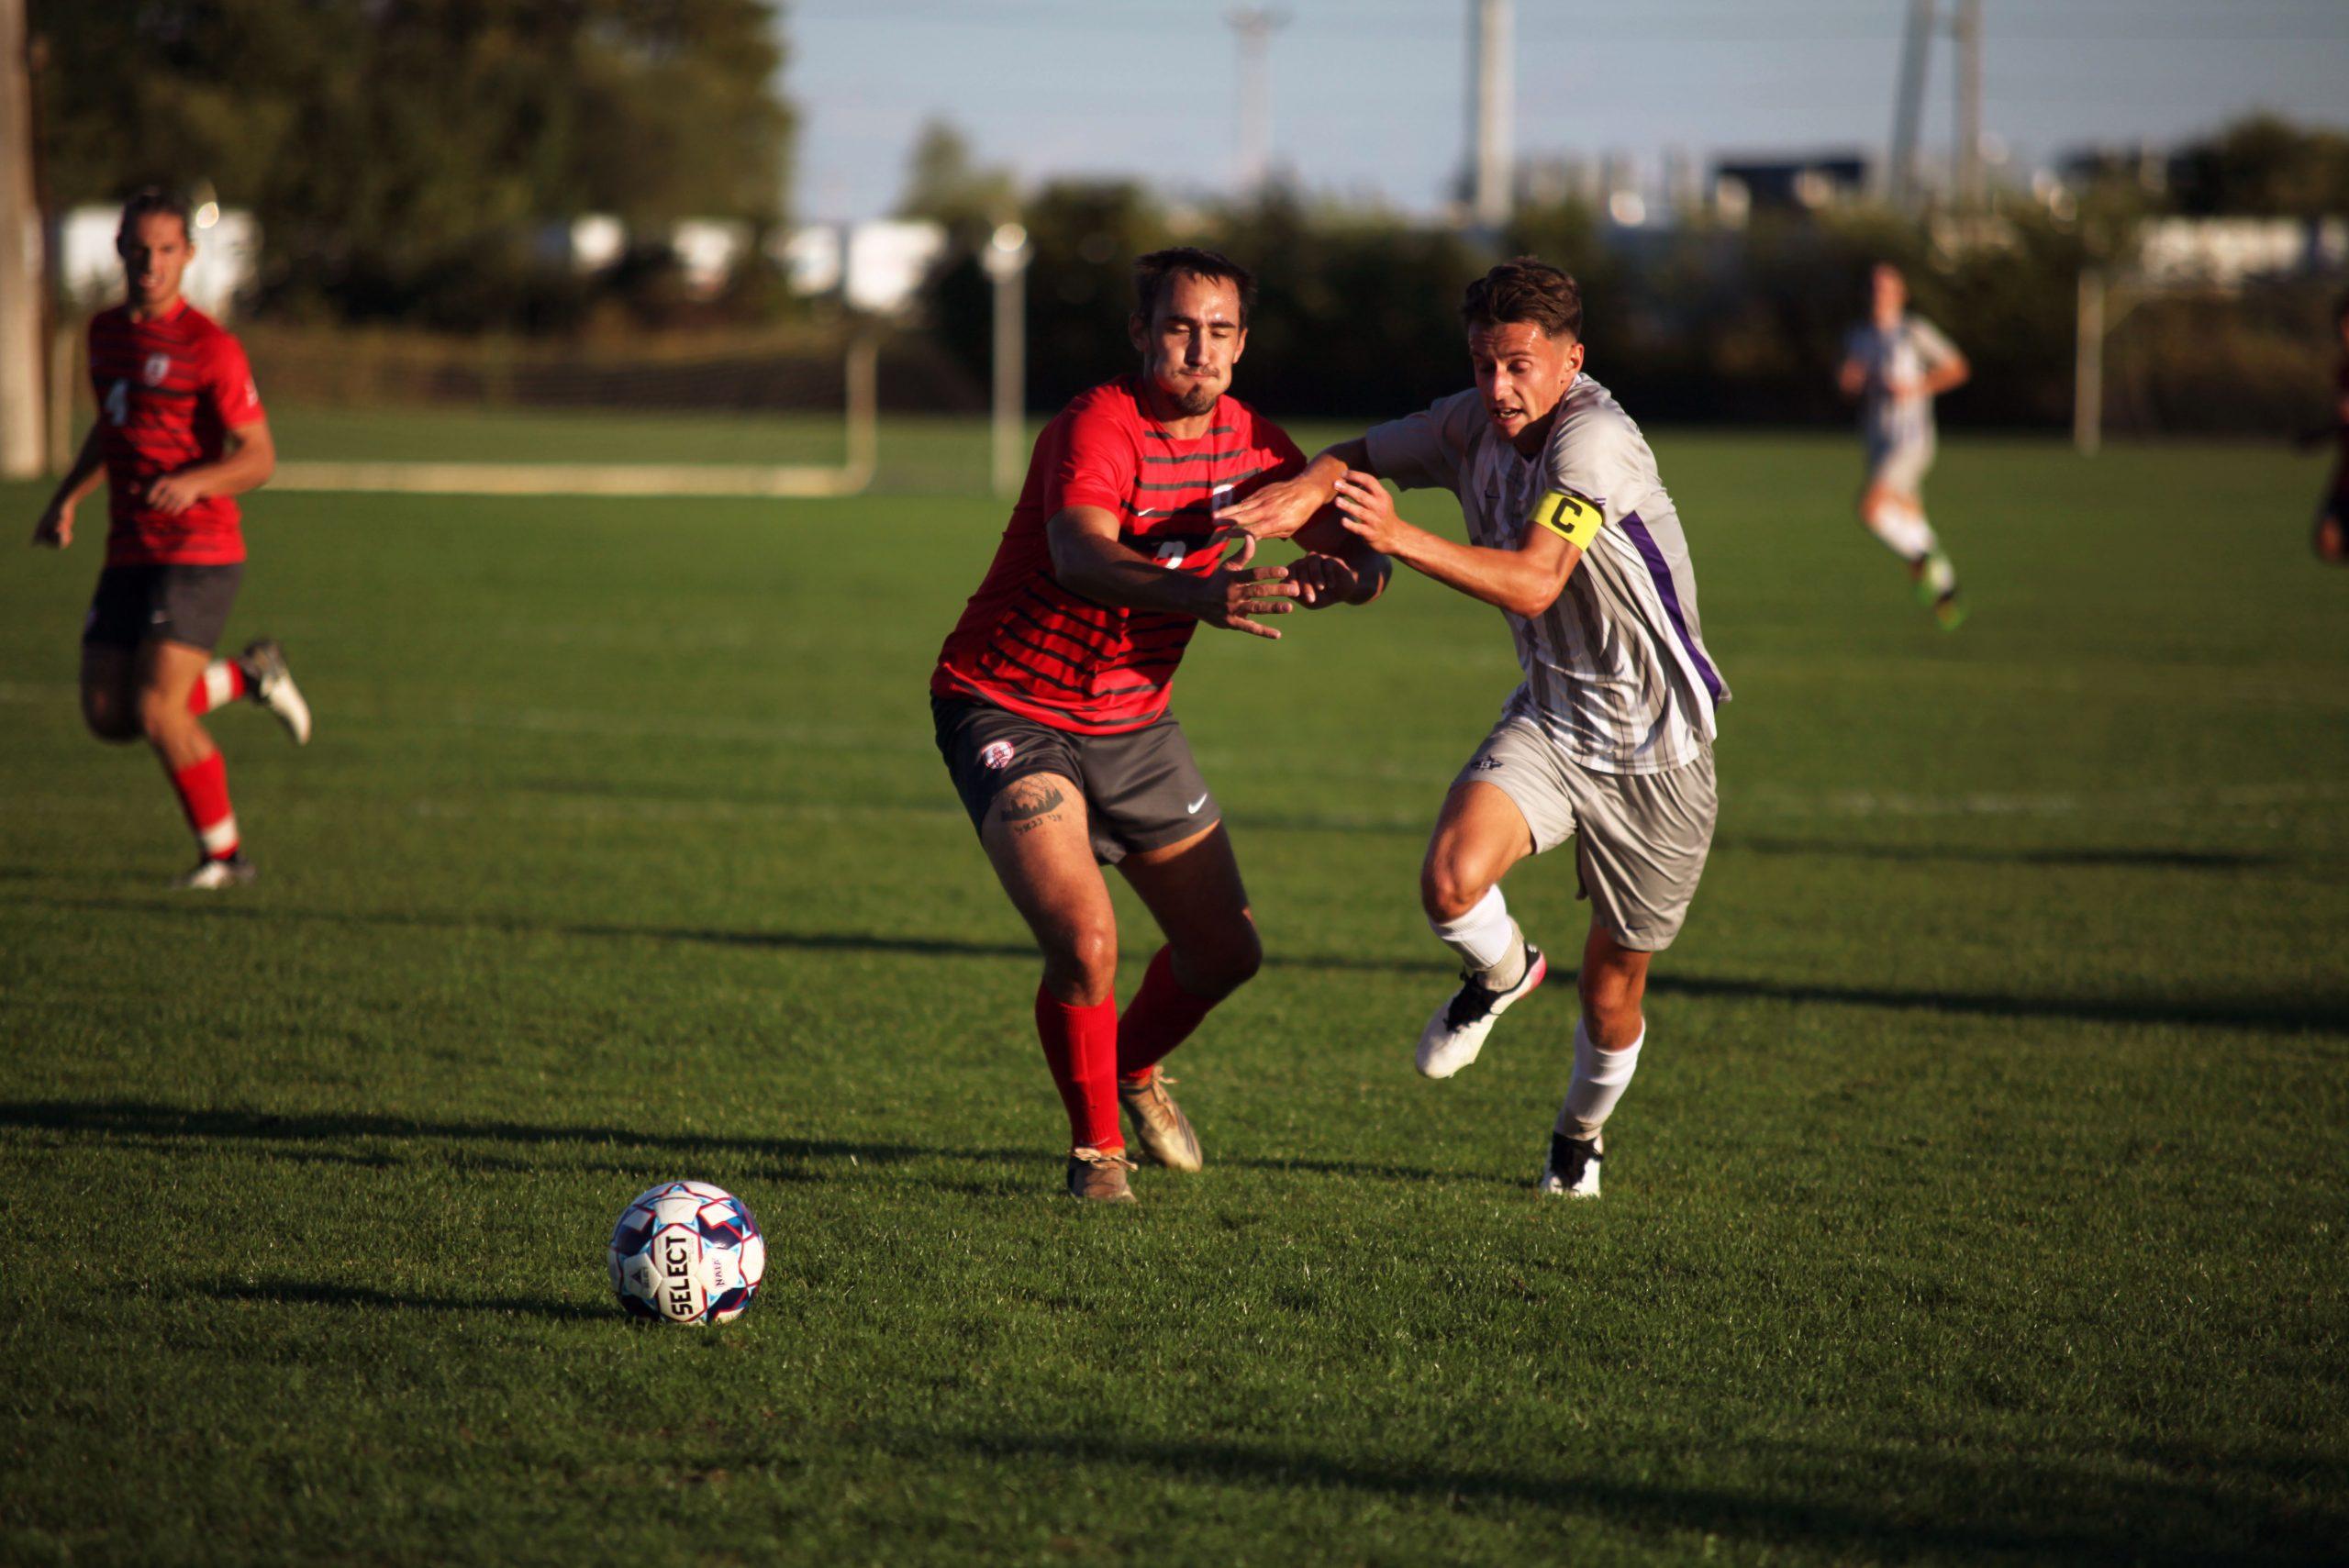 Men's soccer player in action